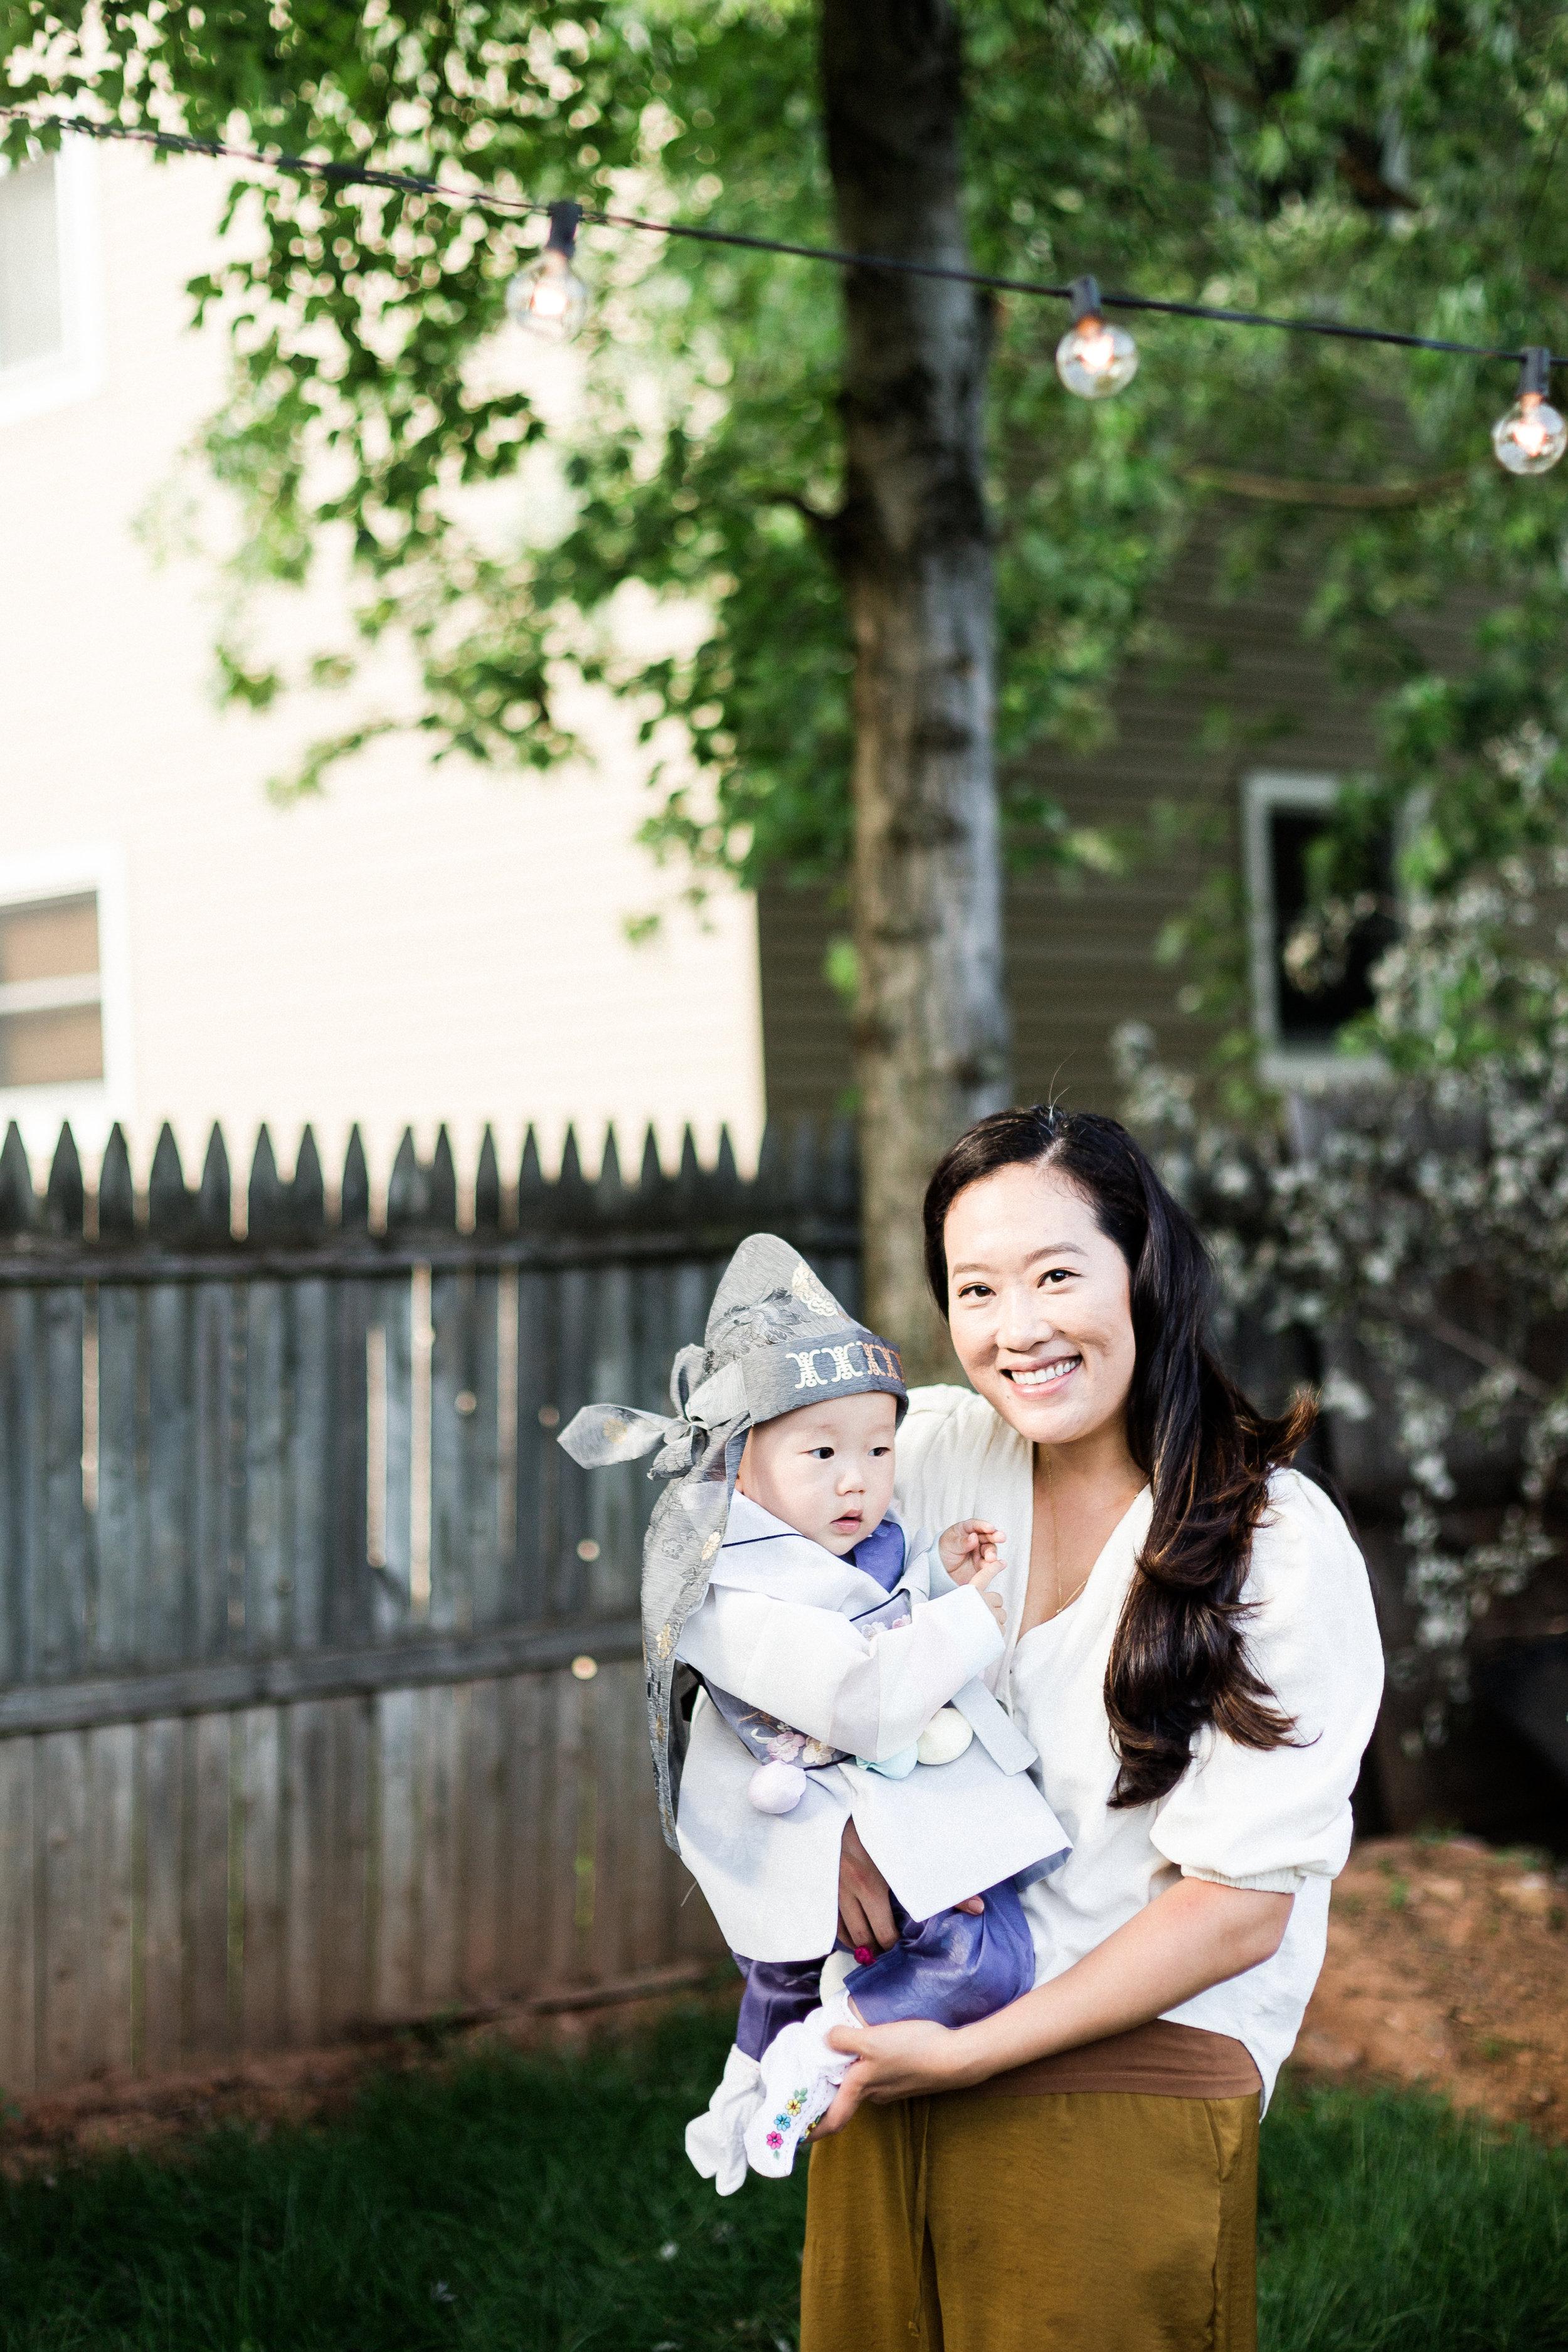 lissie-loomis-photo-nyc-family-photographer-brooklyn-baby3.JPG